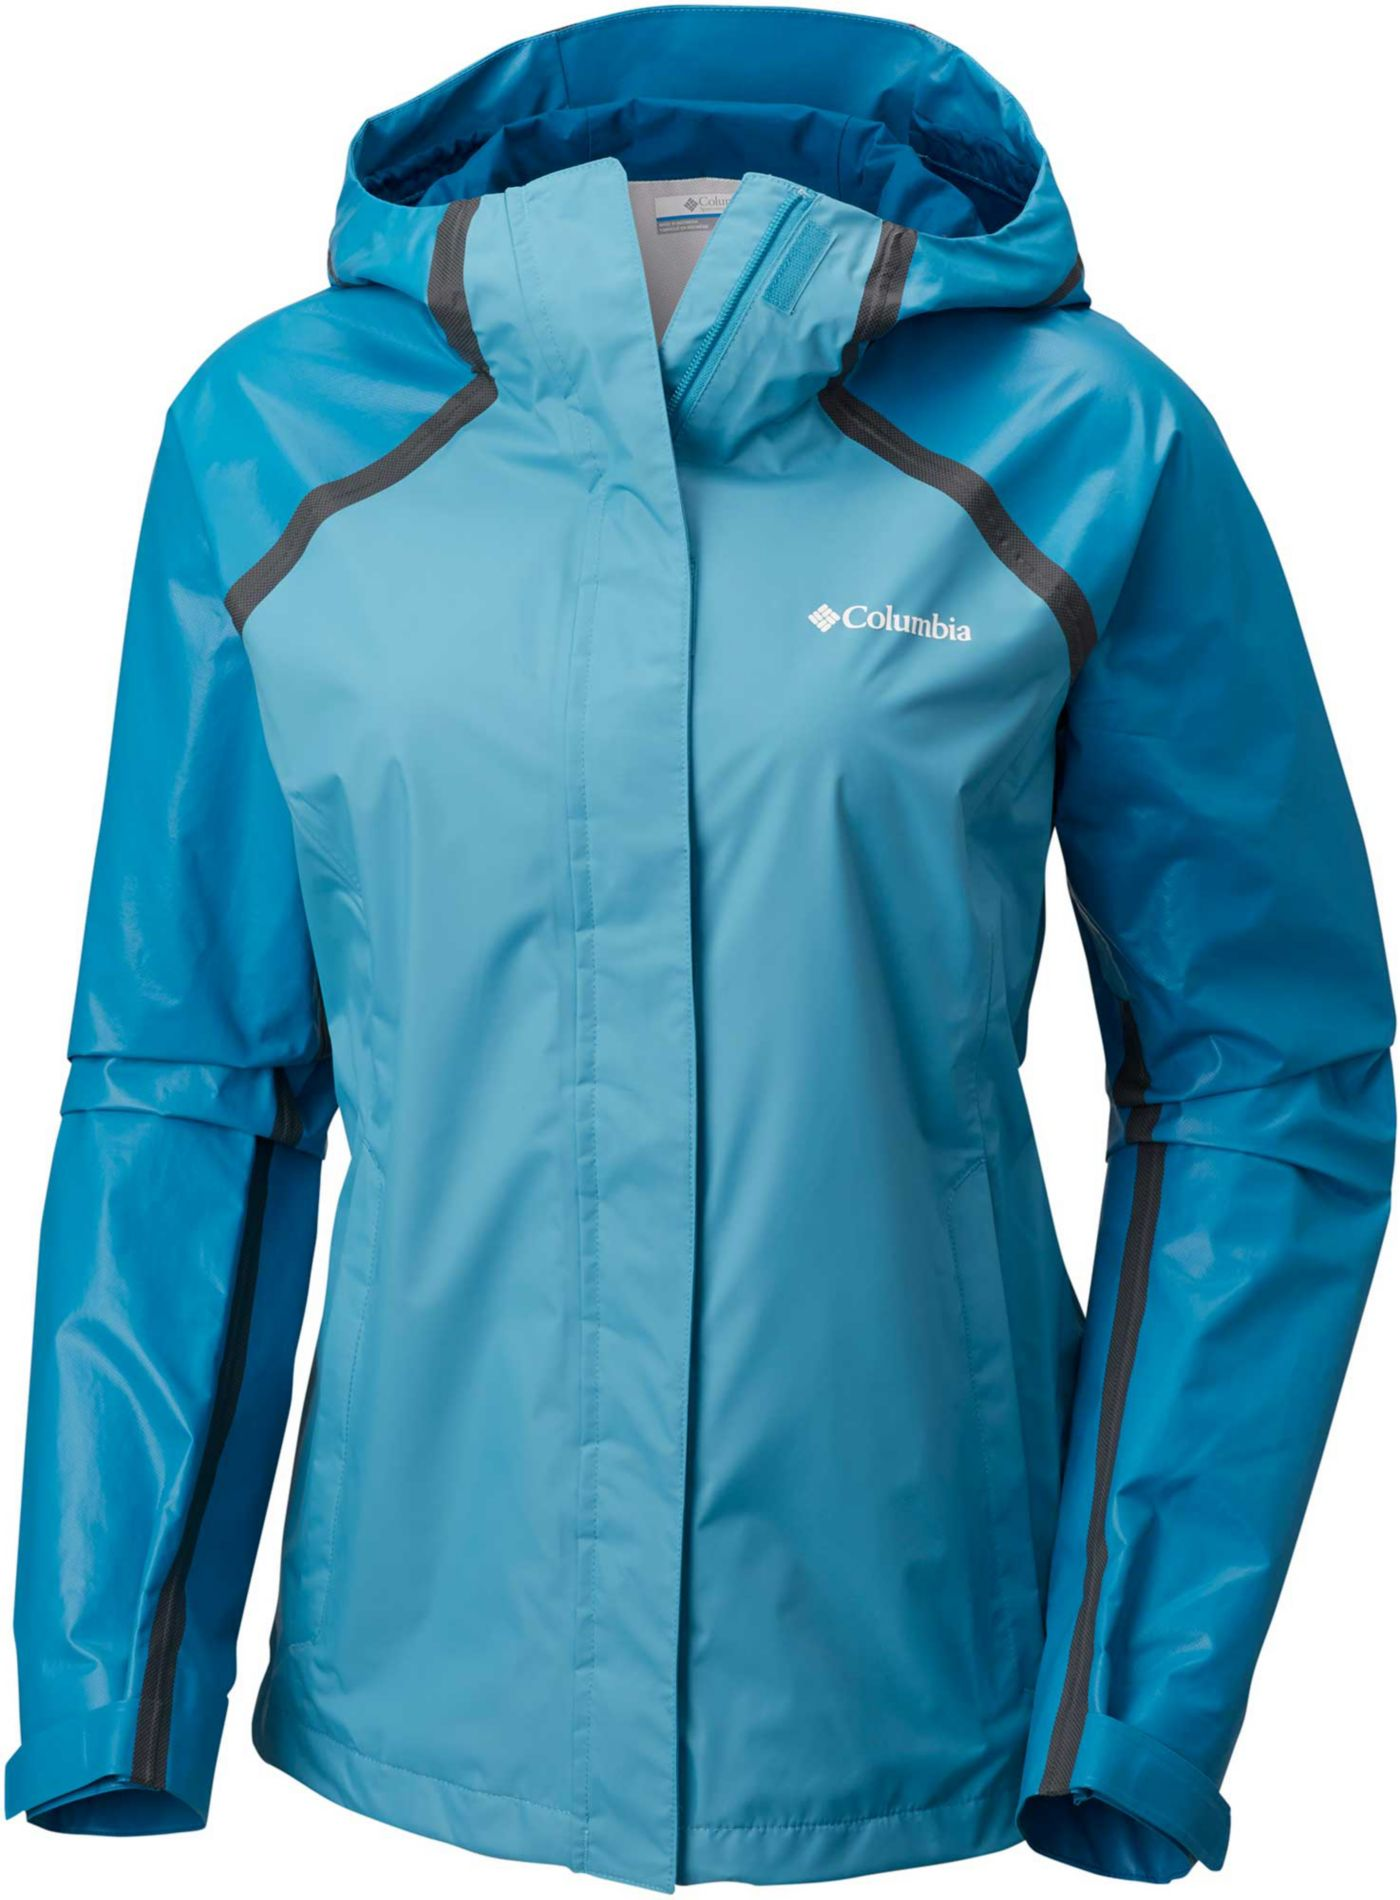 Columbia Women's OutDRY Hybrid Jacket